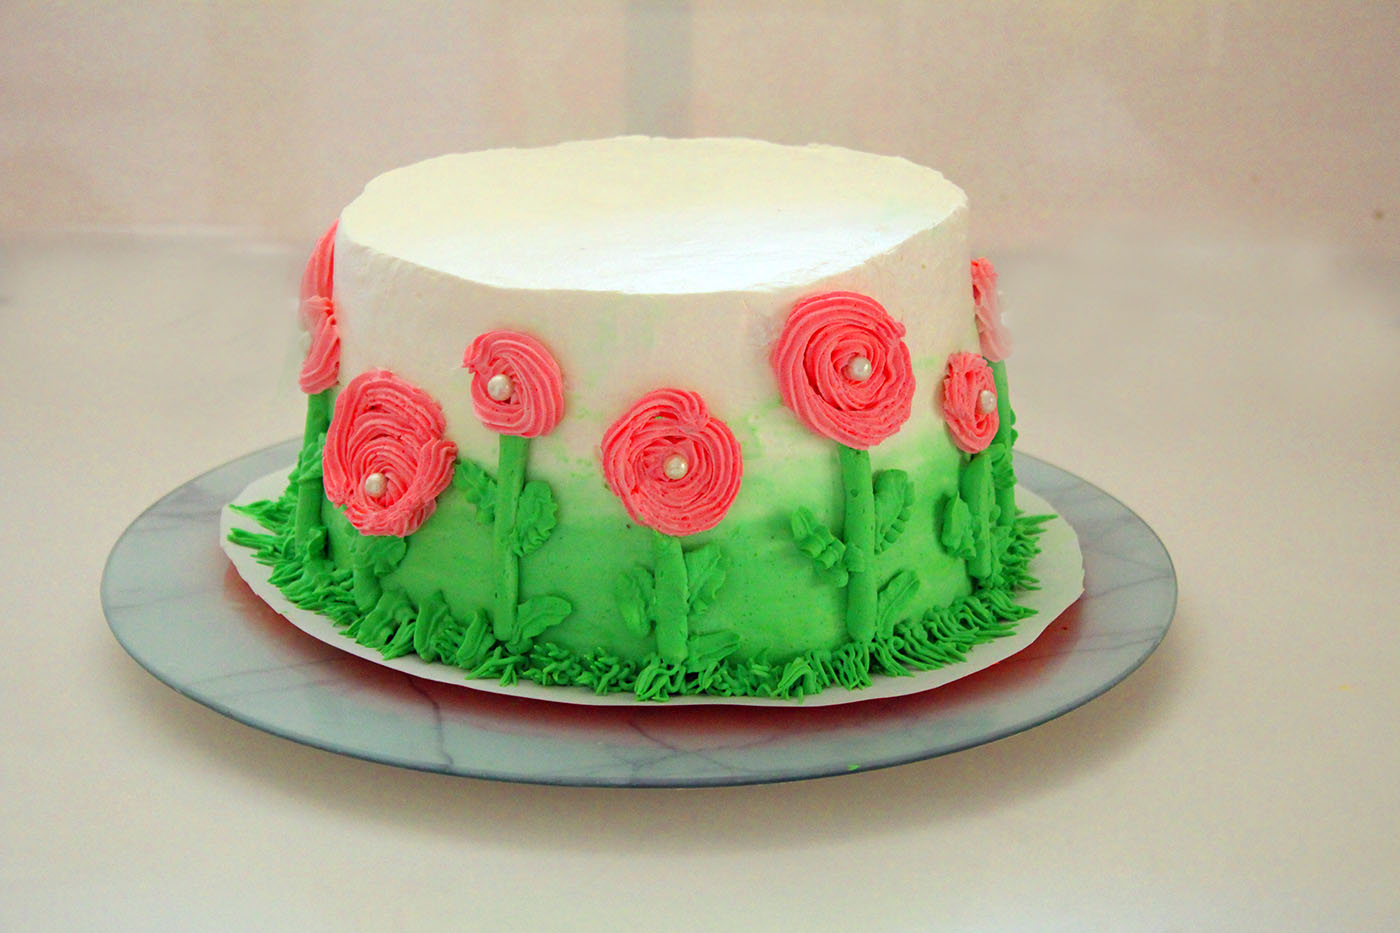 IMG 9415 1 - עוגת זילוף